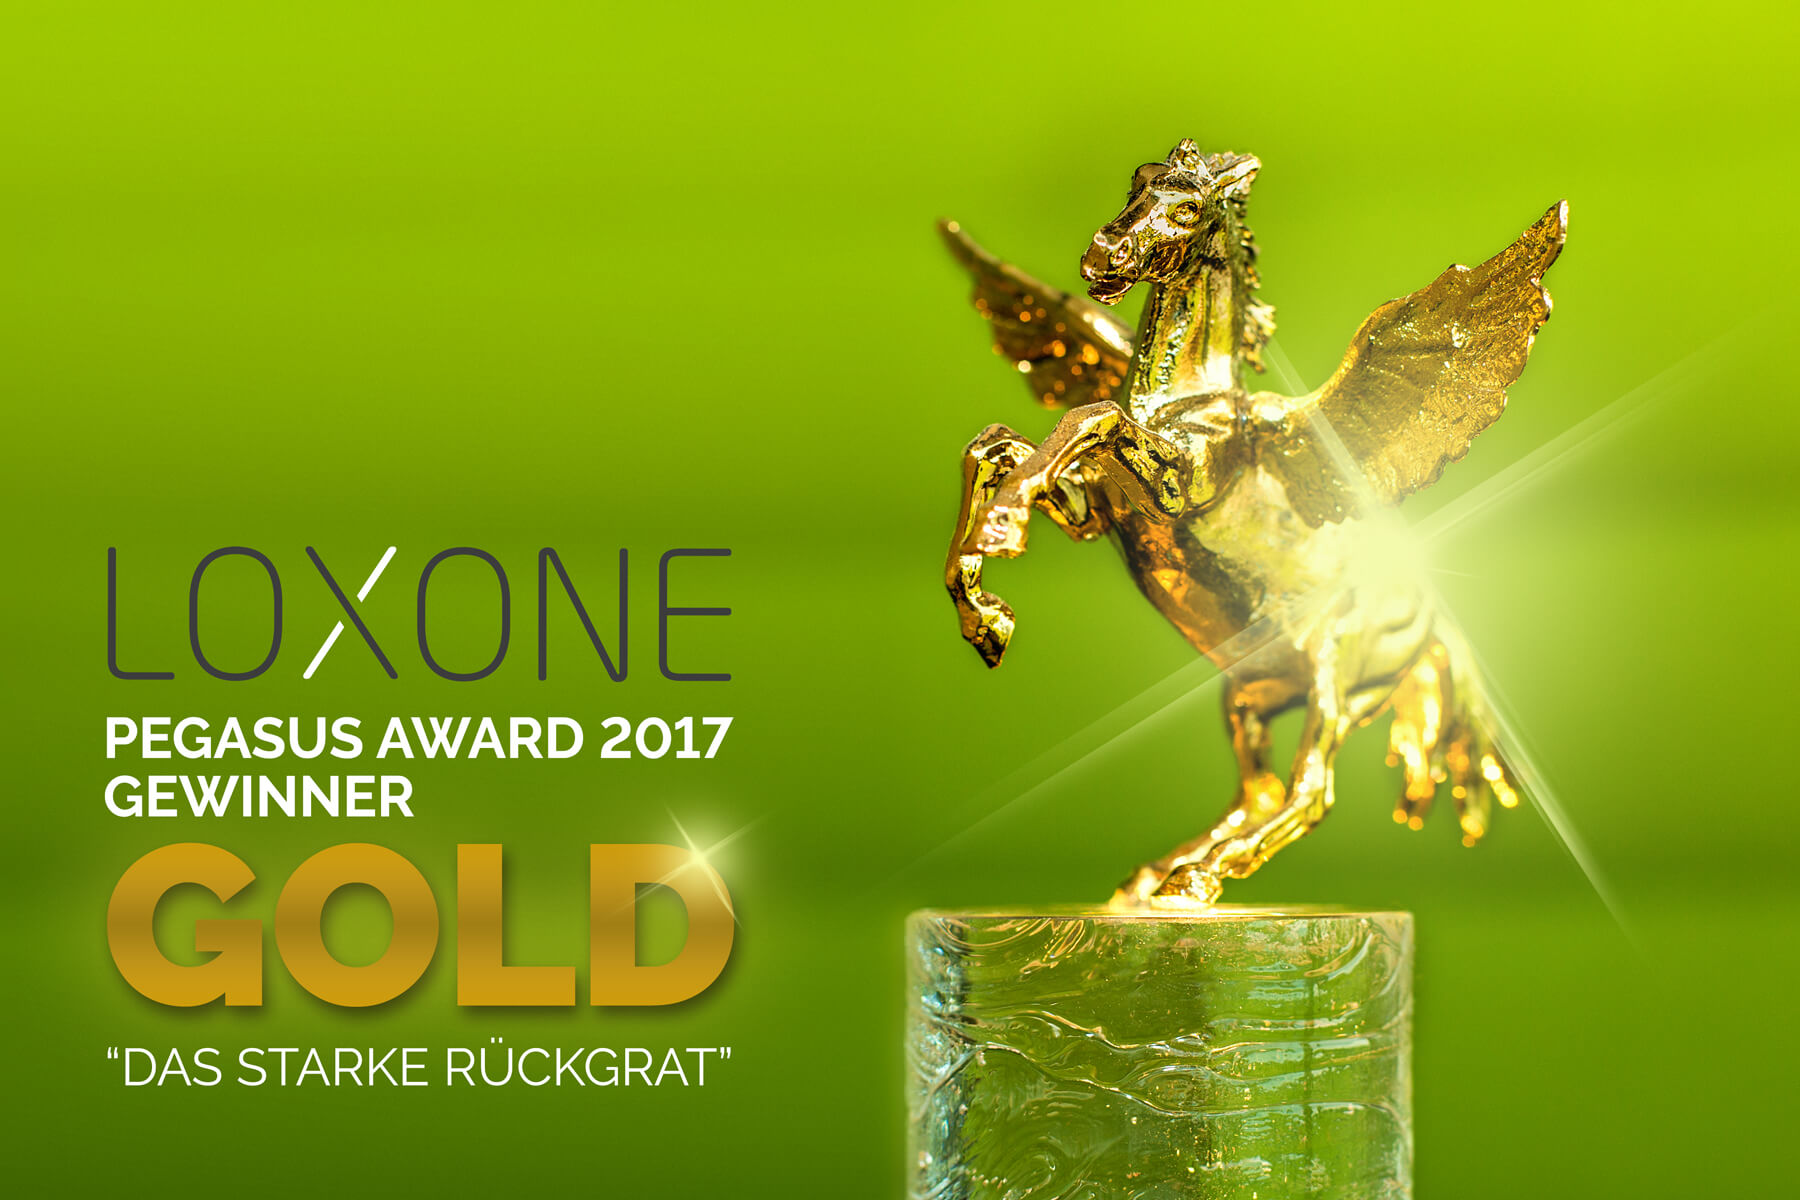 PH_Loxone_Pegasus-Award-2017